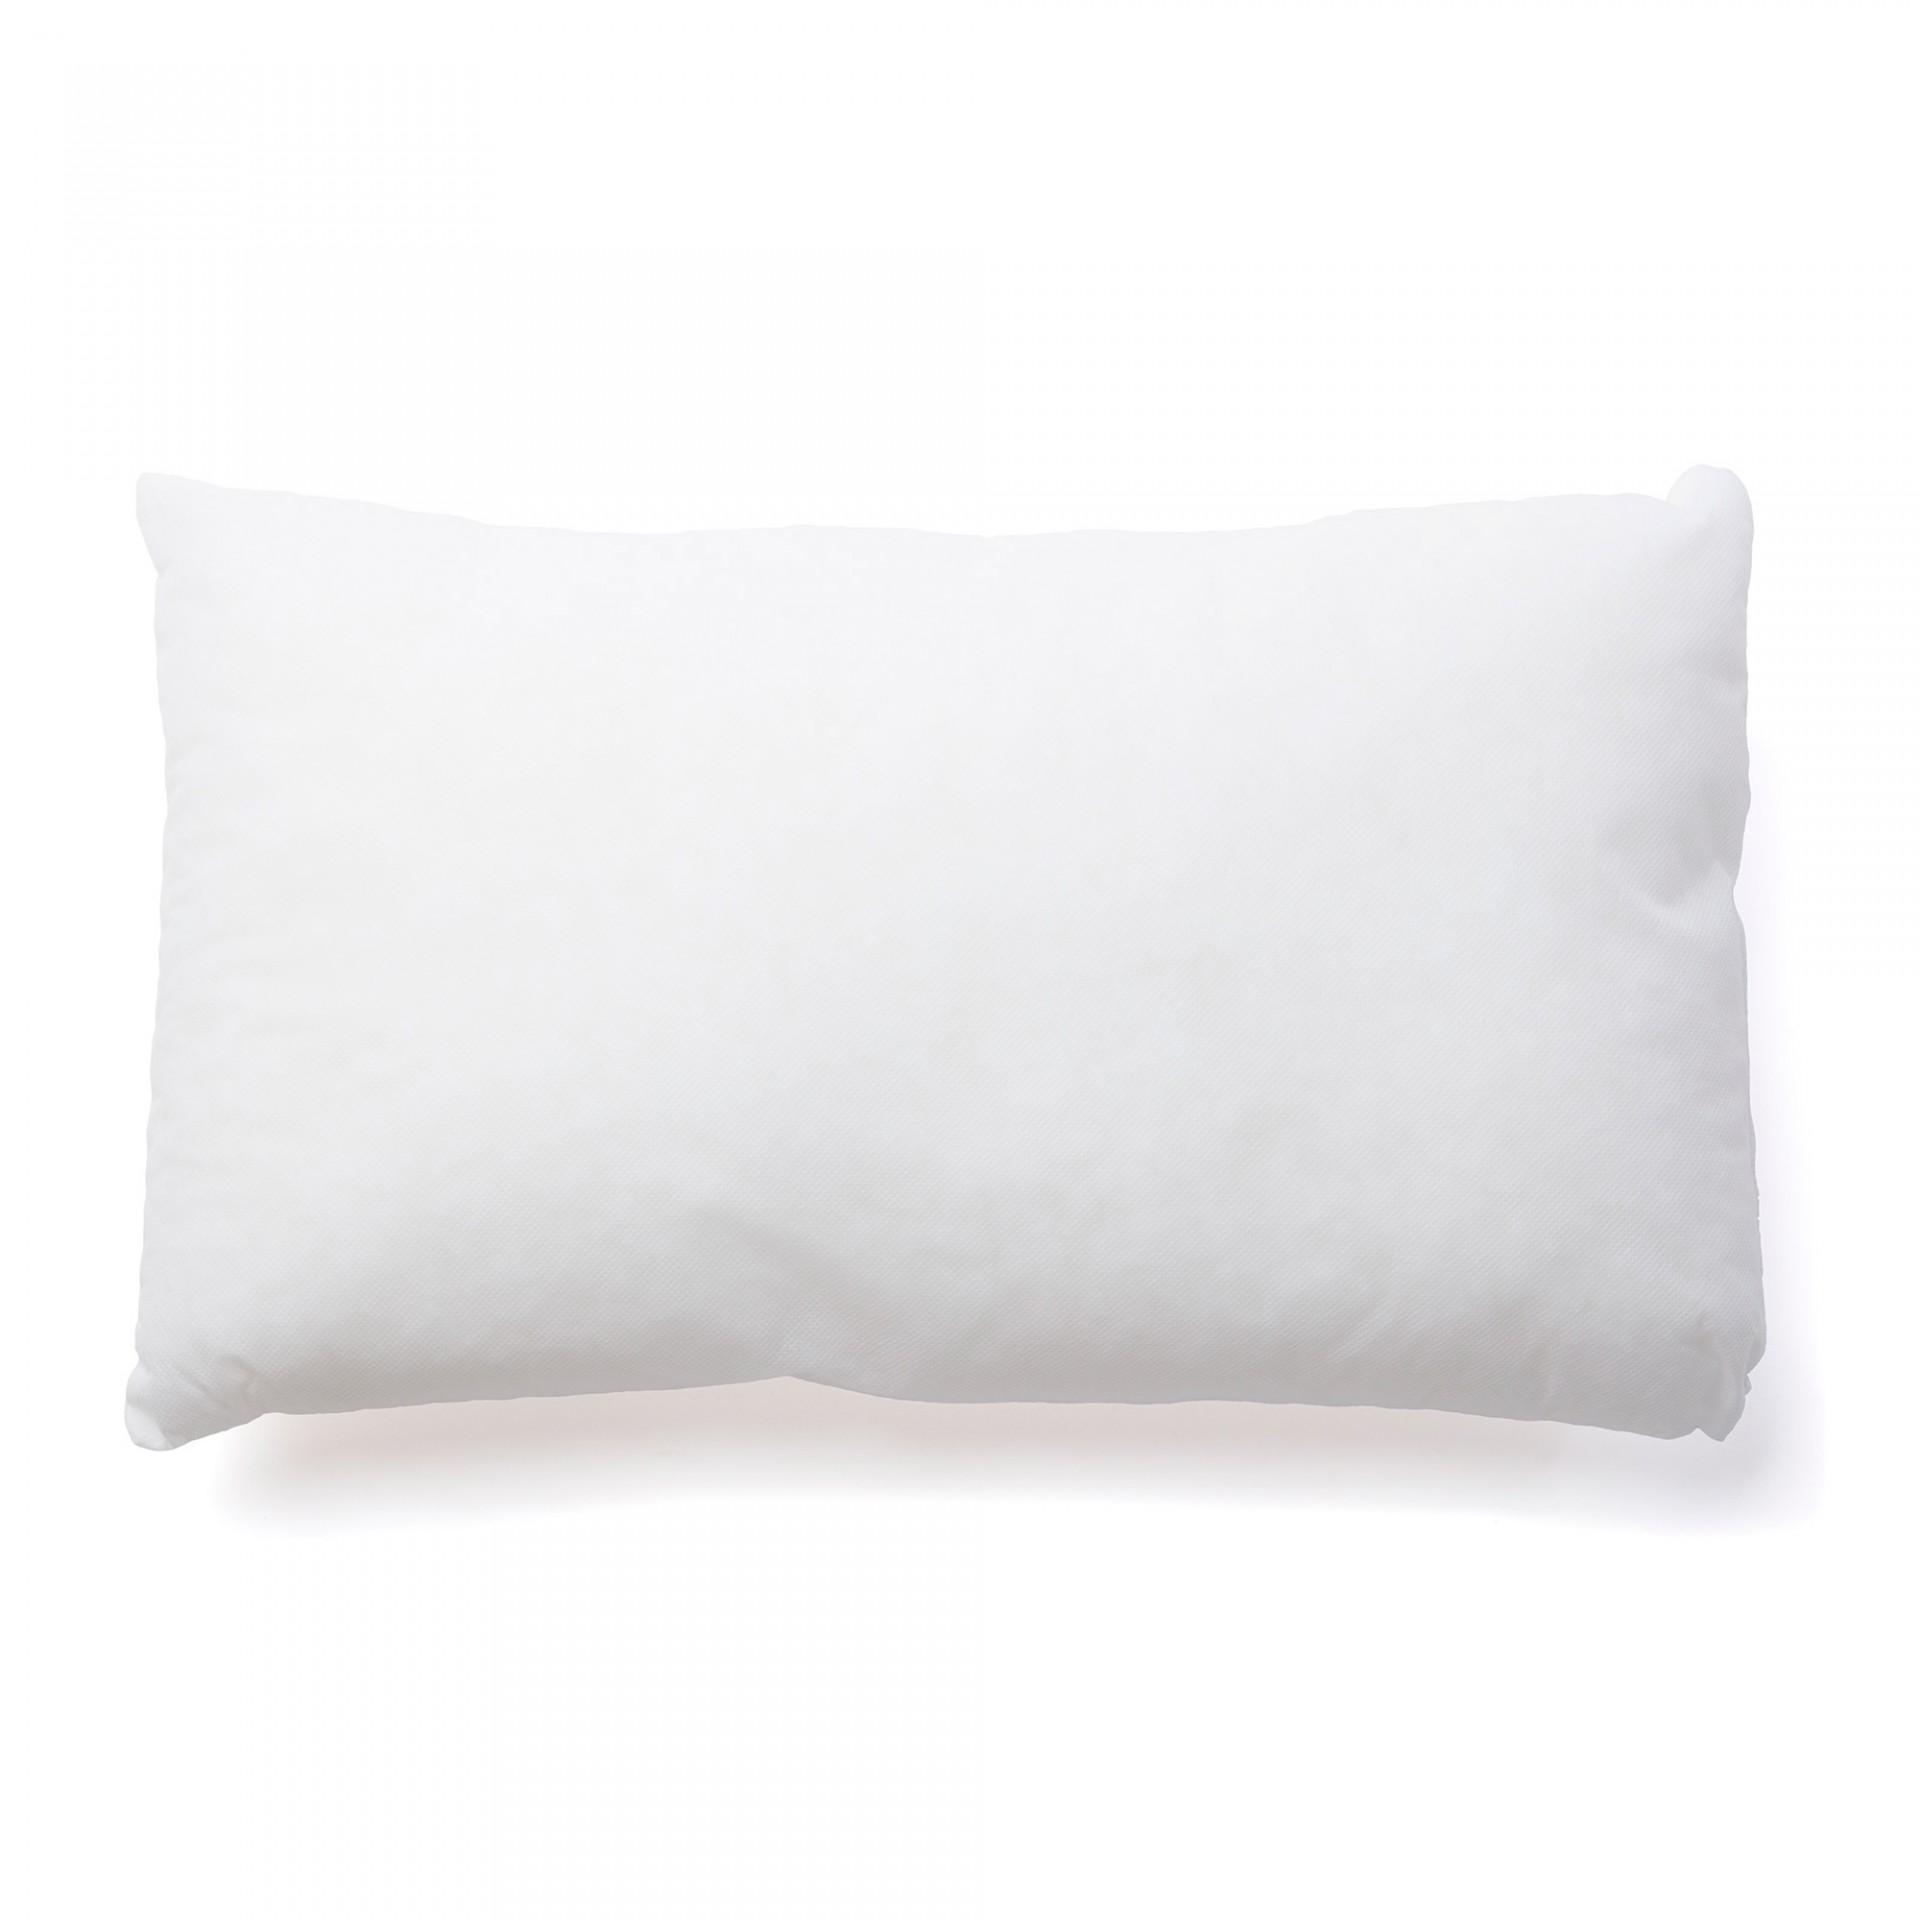 Enchimento p/almofada, 30x50 cm